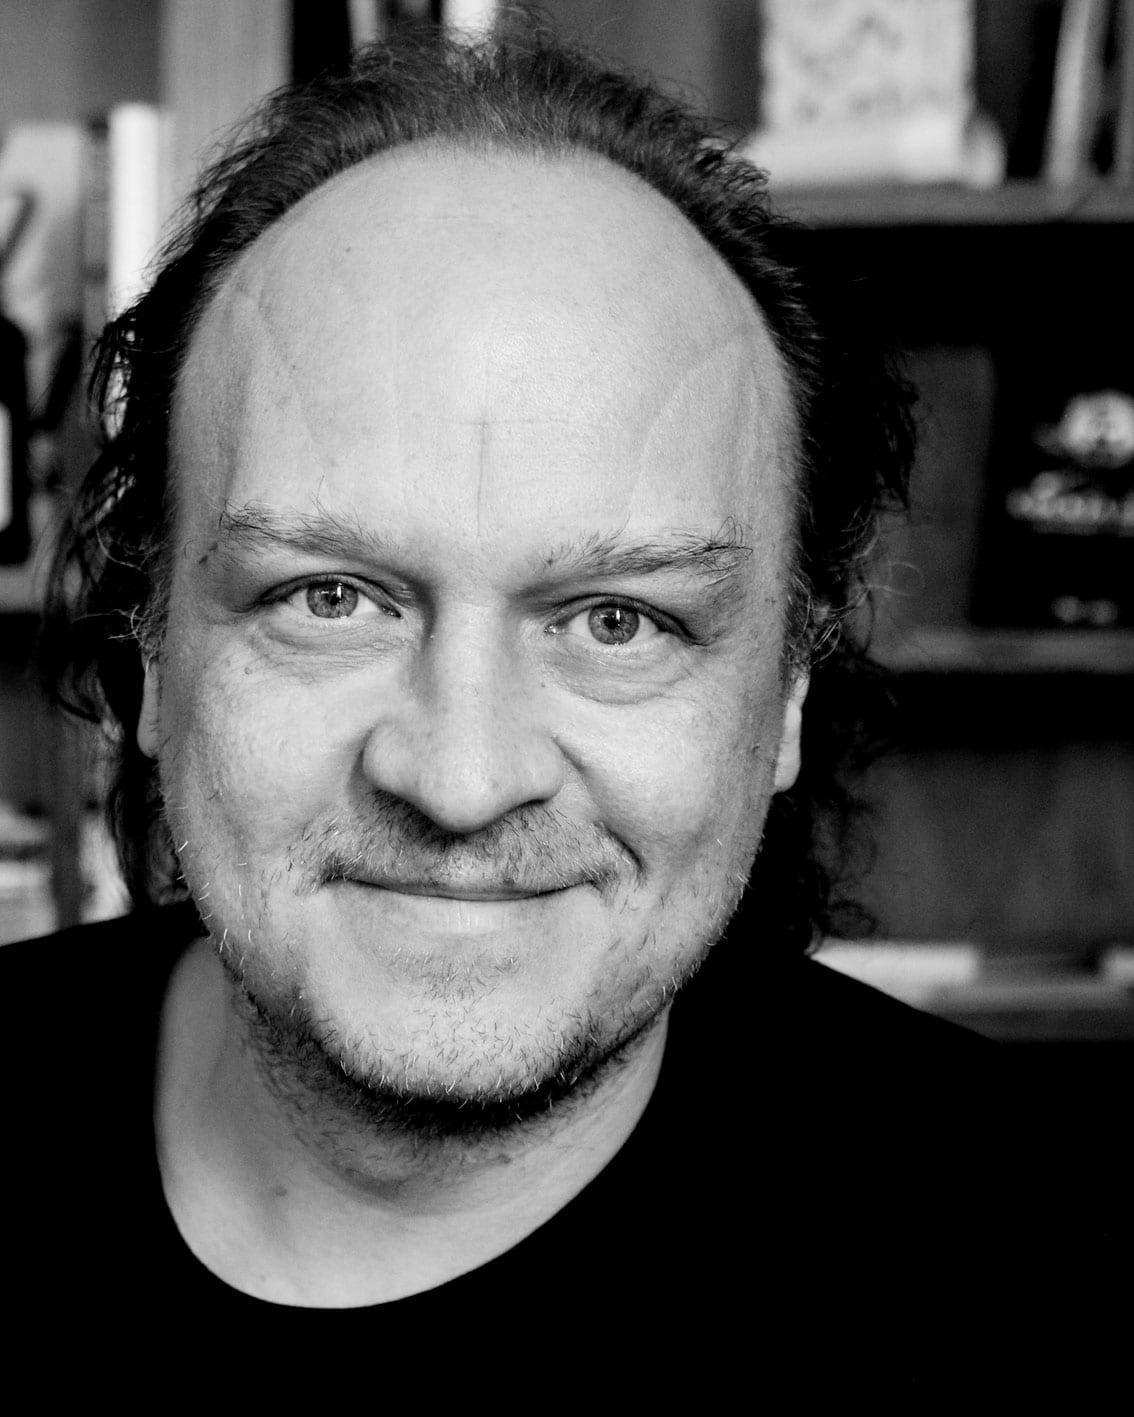 Jens Hasenbein